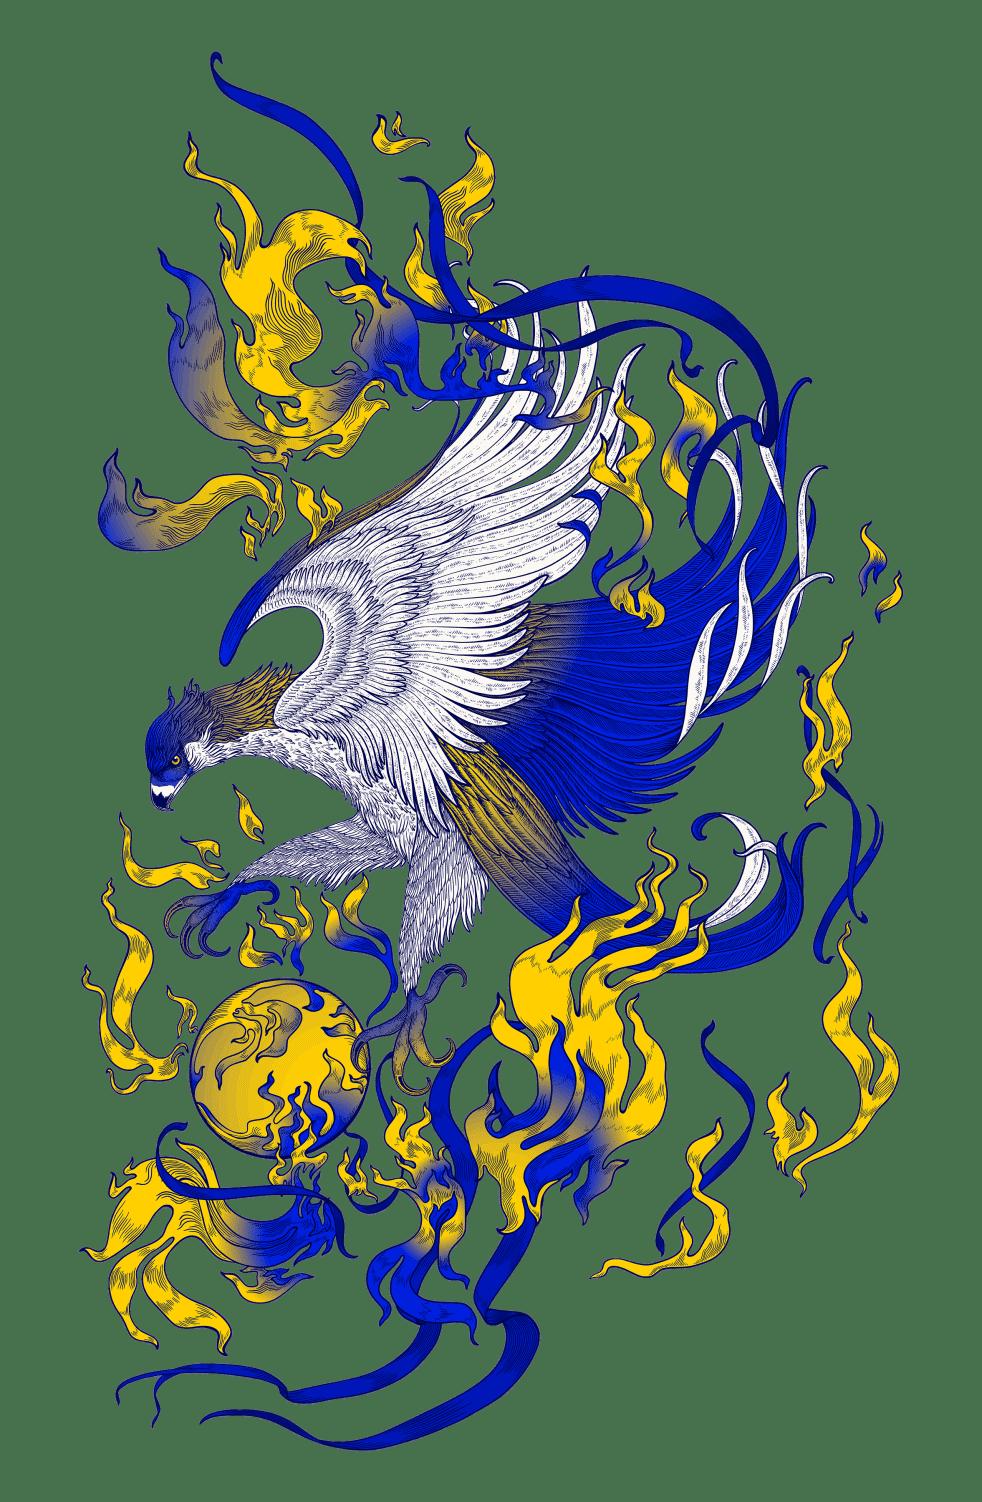 sunlight-air-eagle